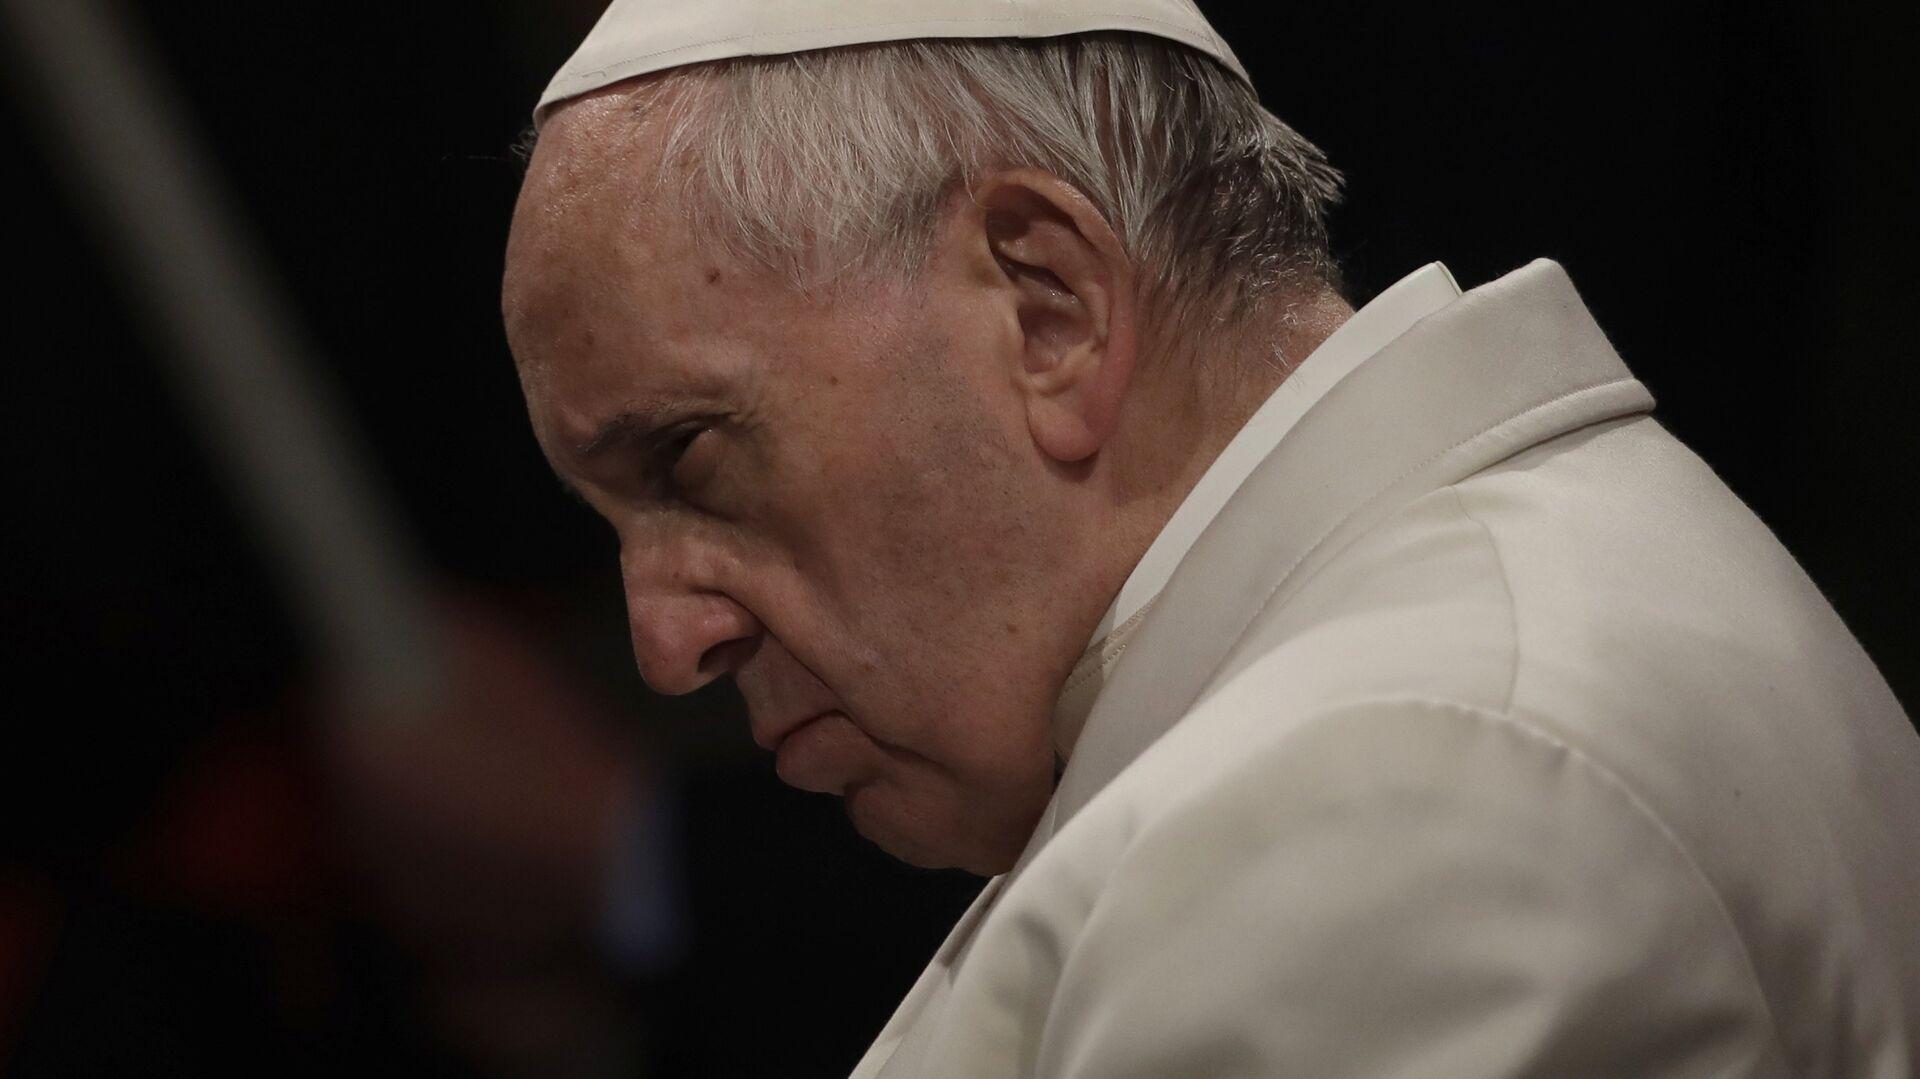 Папа Римский Франциск - РИА Новости, 1920, 07.06.2020